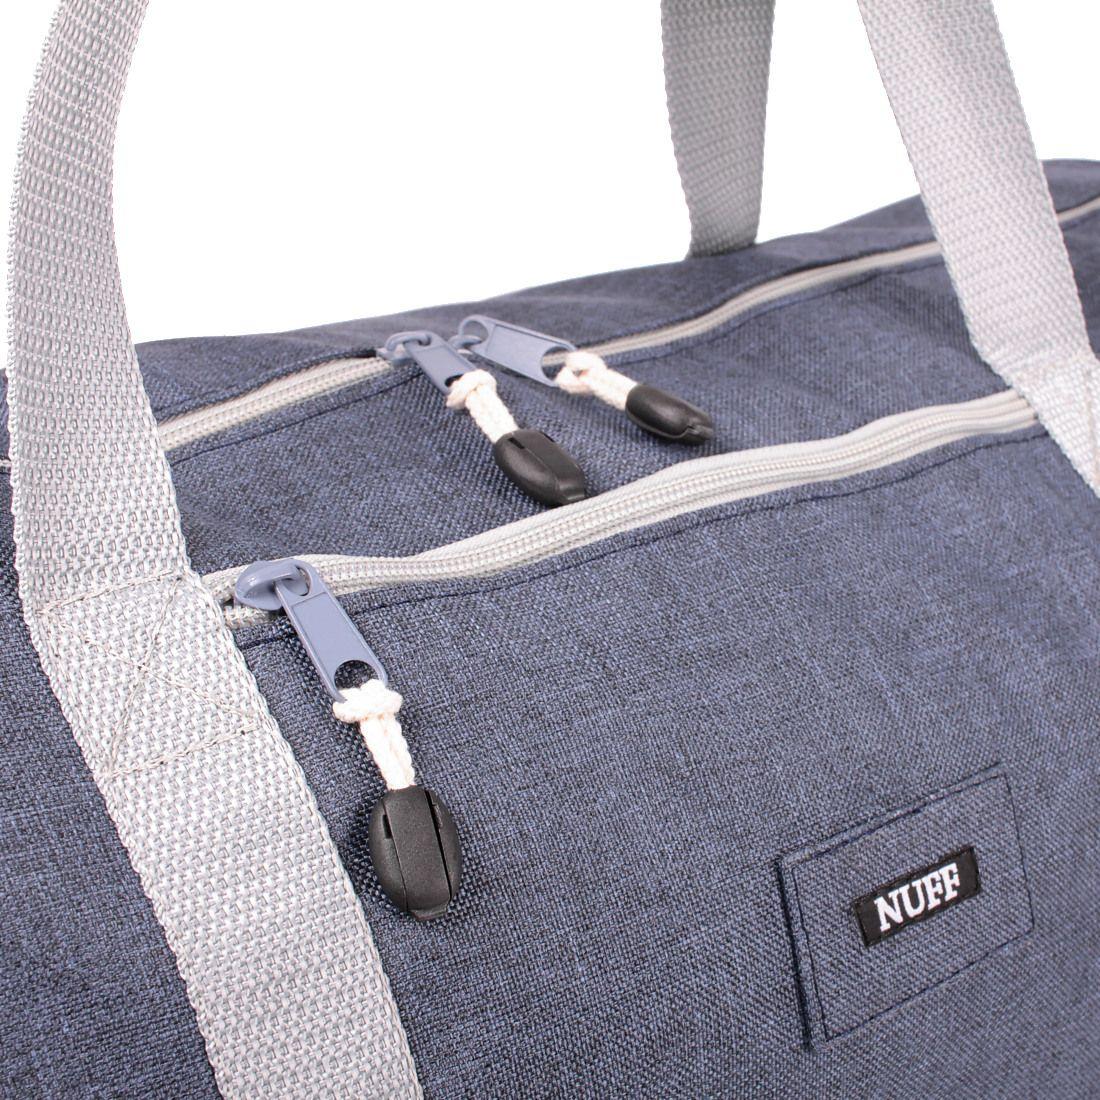 4da17858bec3d Torba Sportowa podróżna Nuff Duffel bag – Niebieski melanż